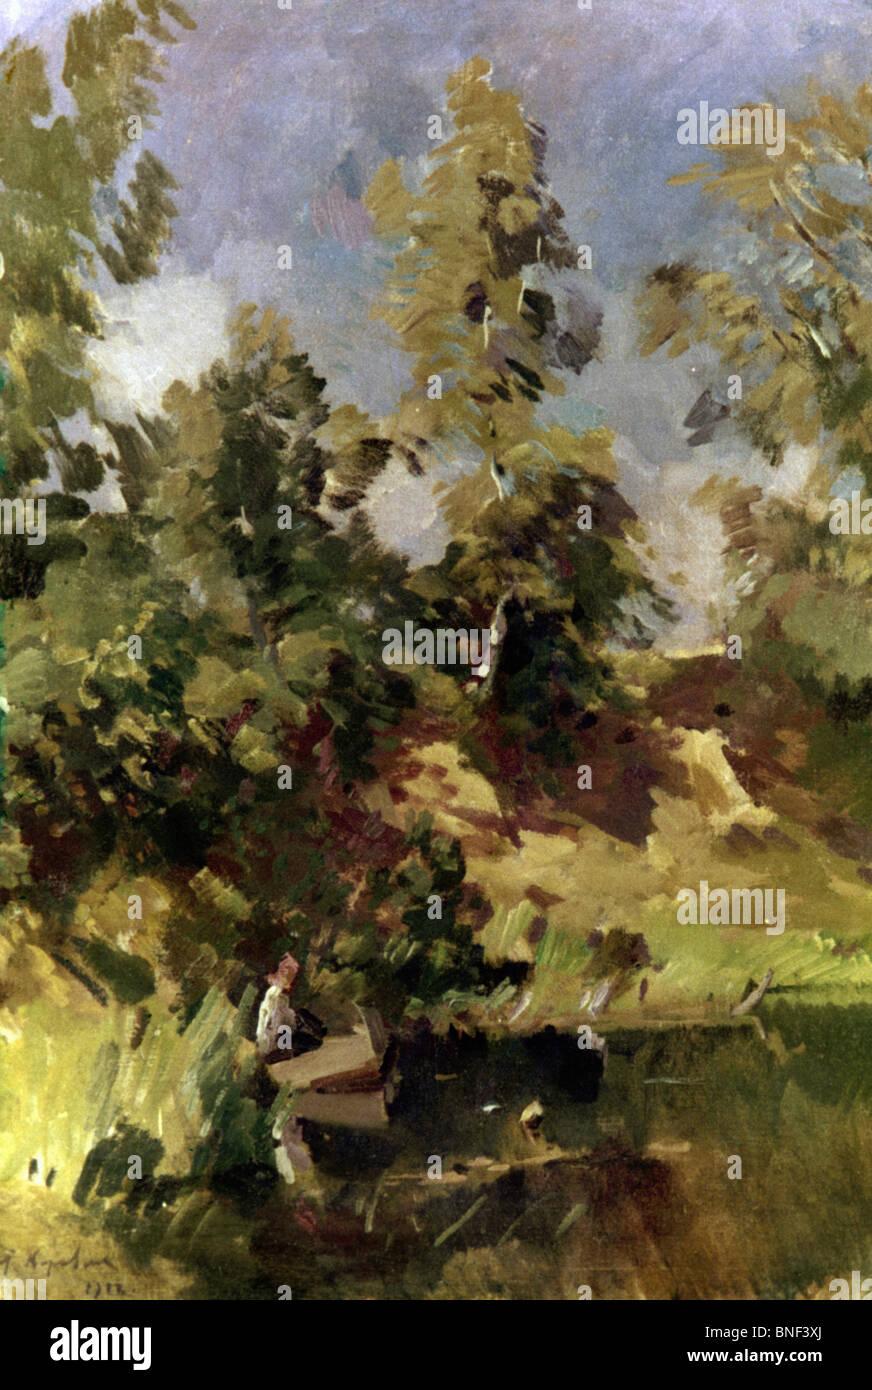 Wind by Konstantin Alekseevic Korovin, 1916, 1861-1939 - Stock Image